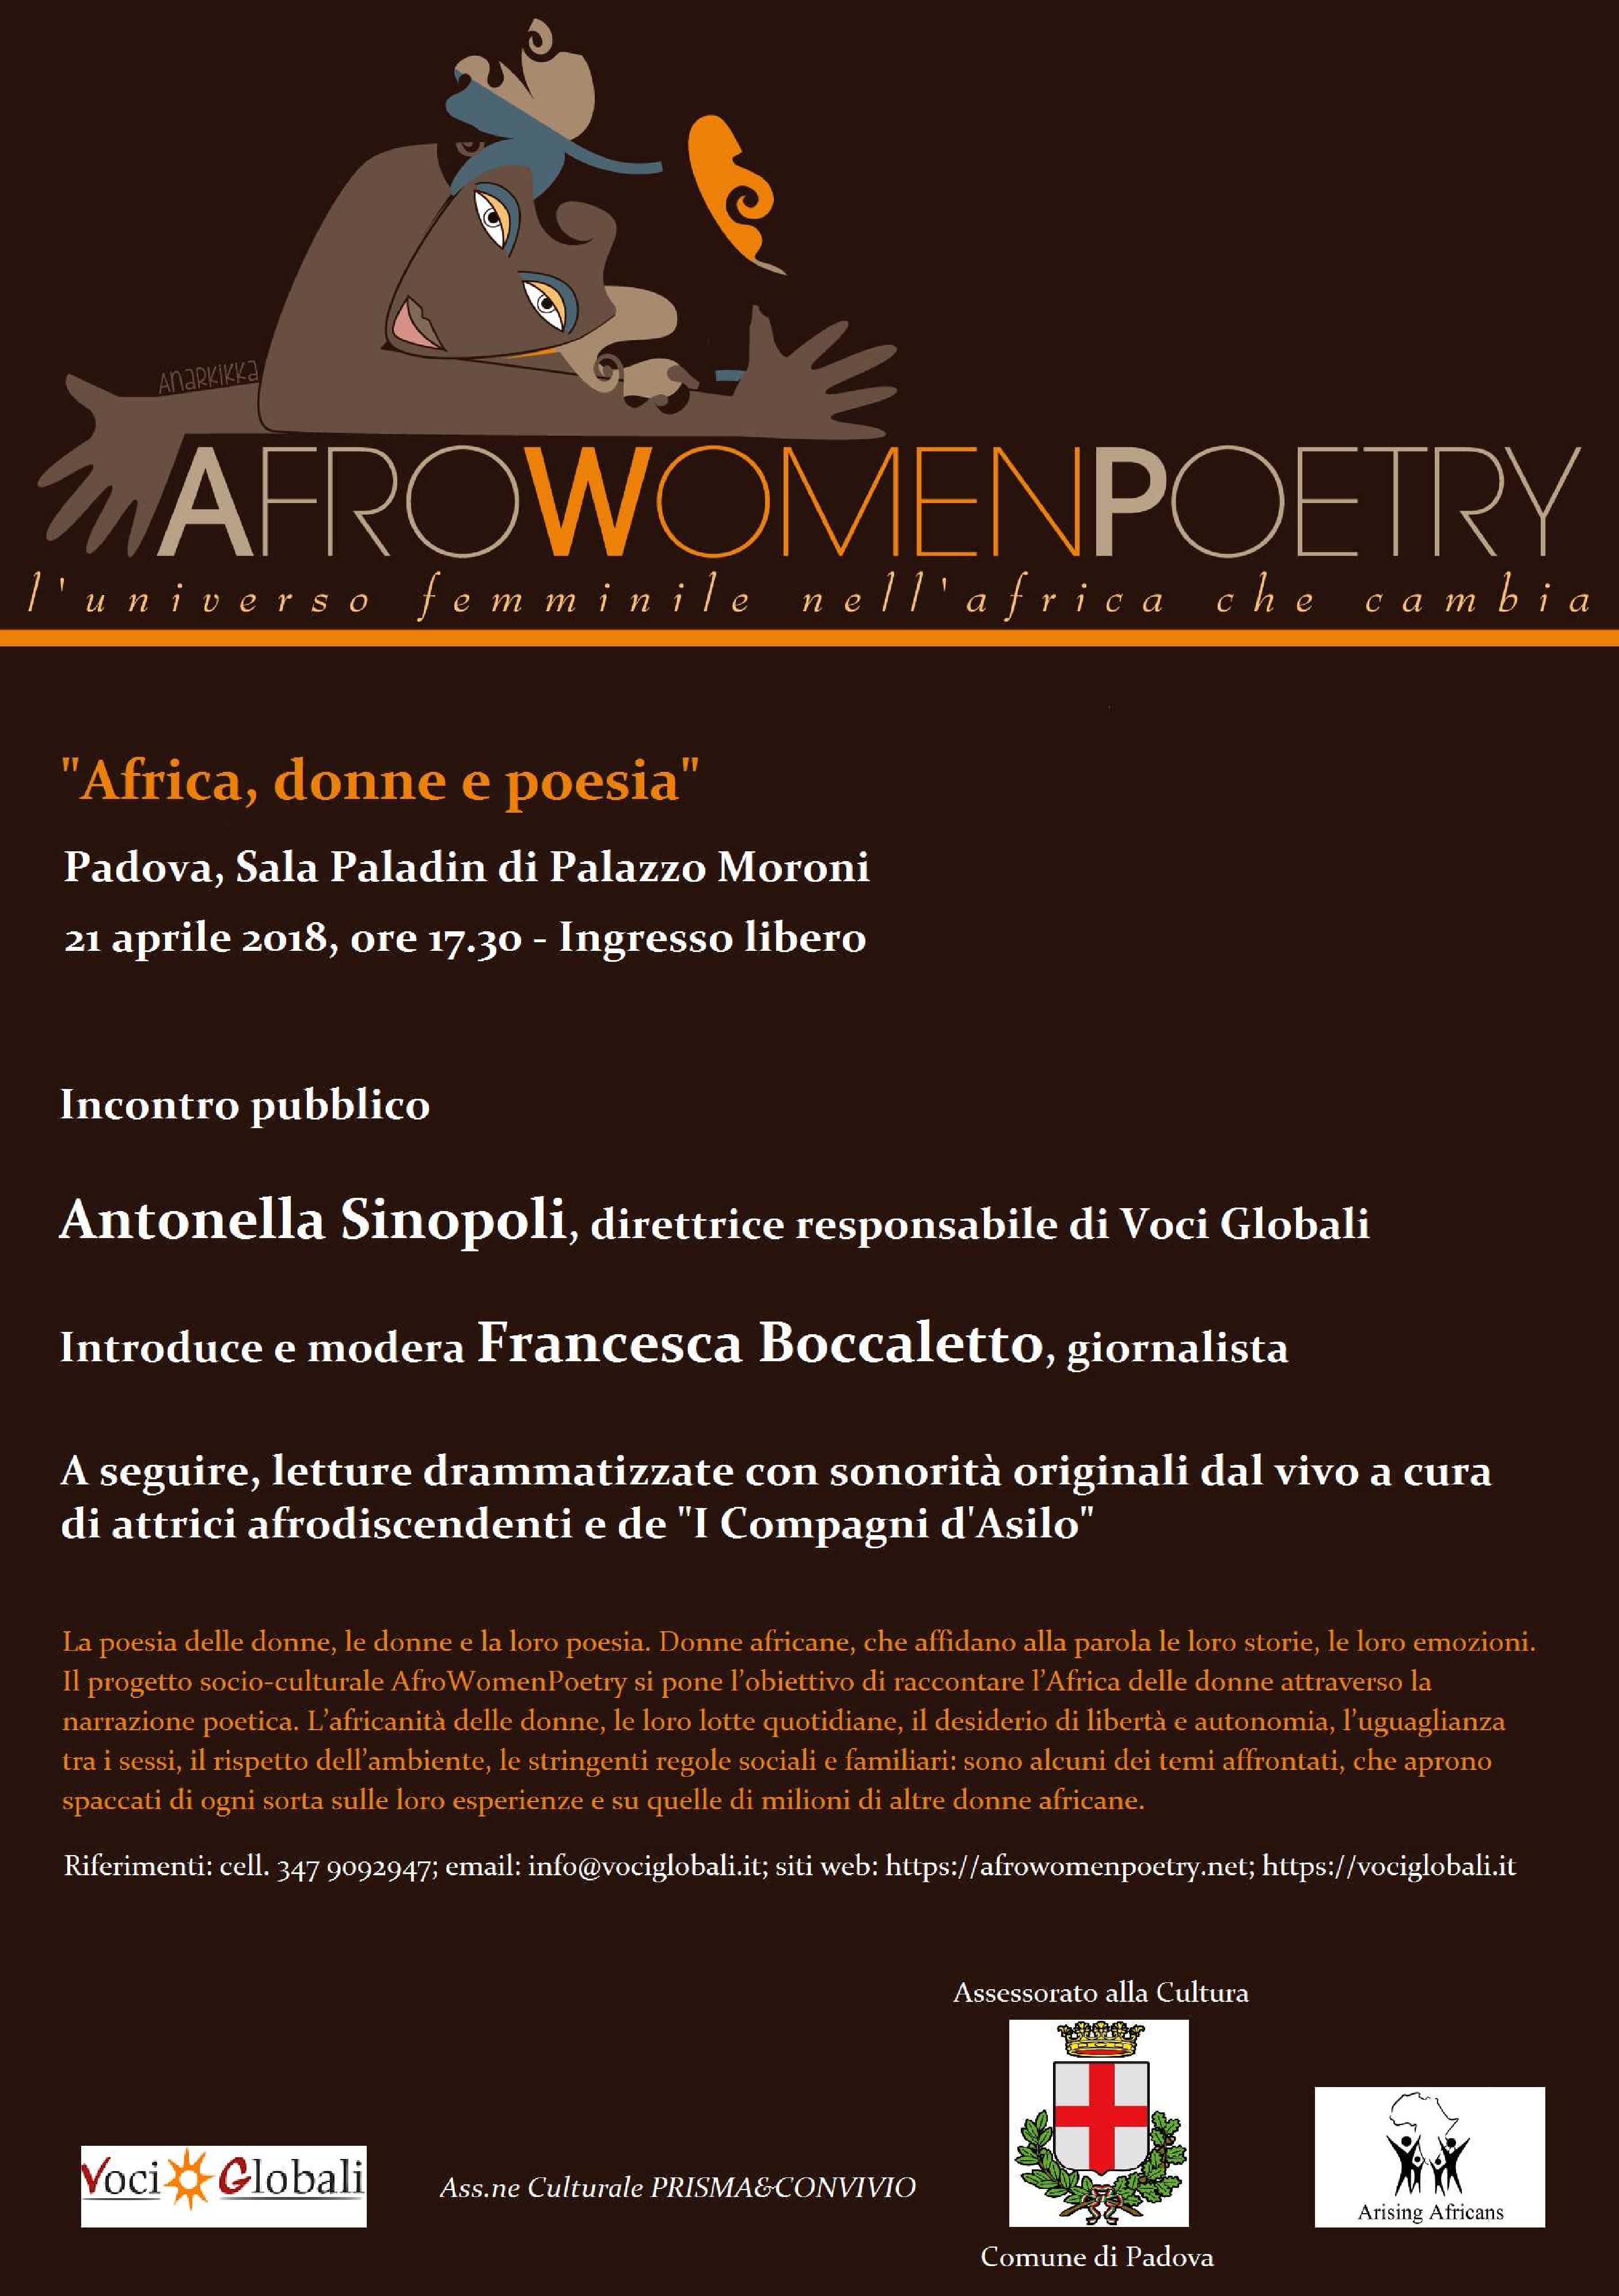 AfroWomenPoetry a Padova